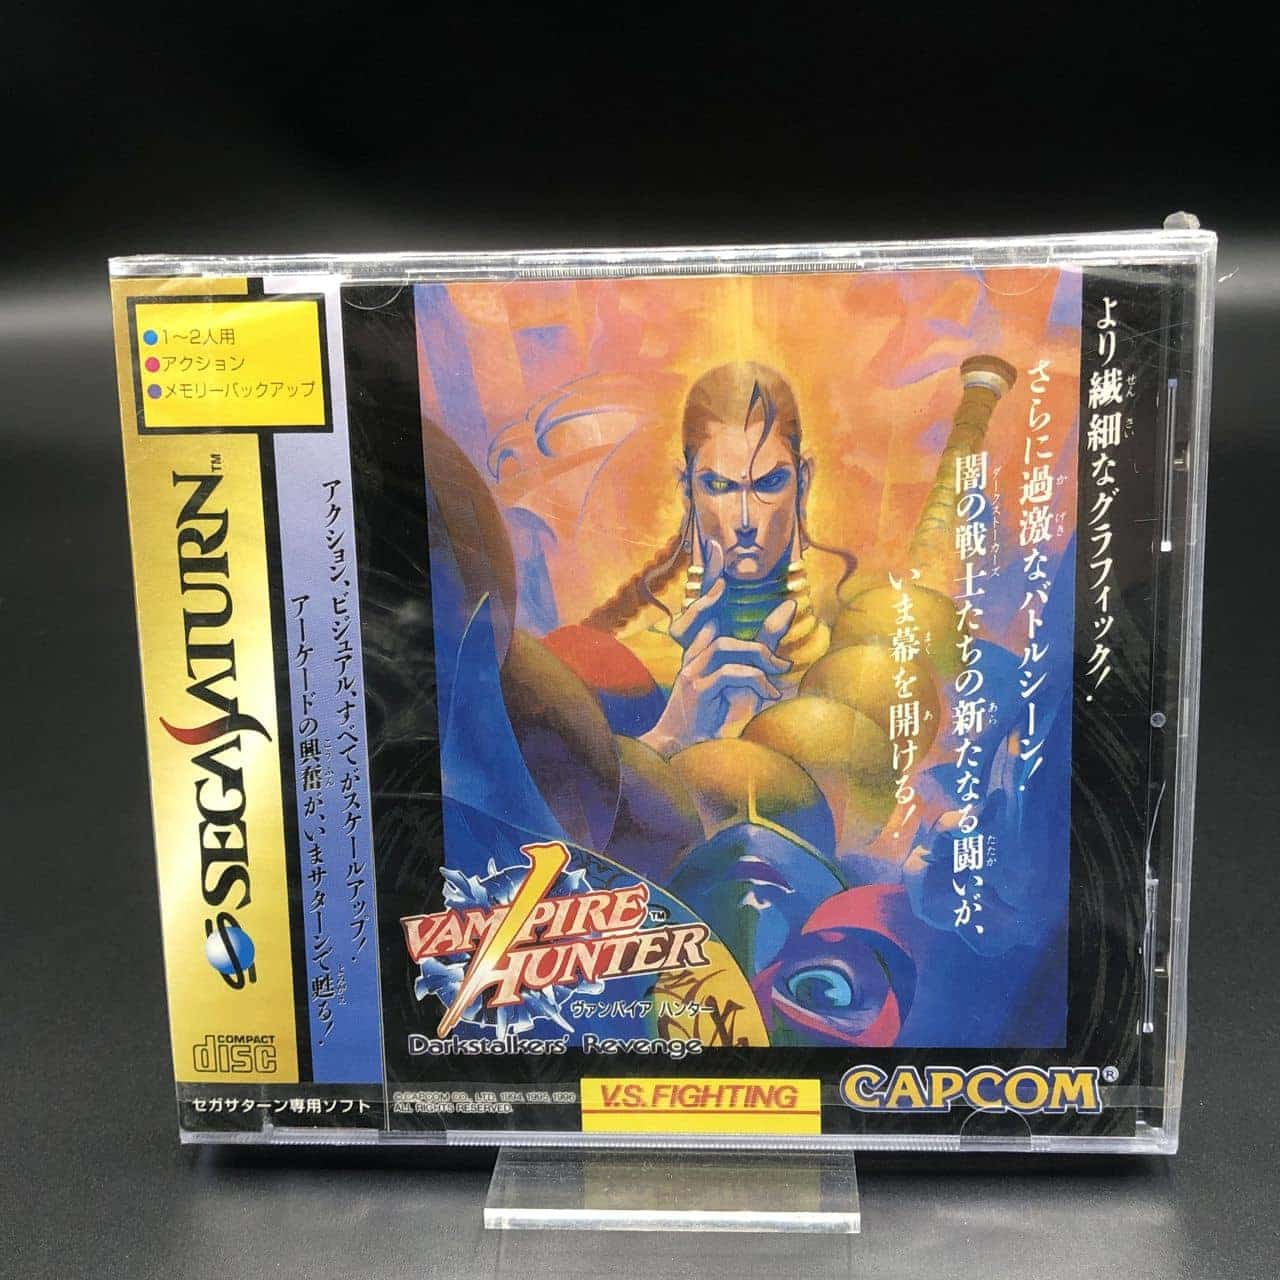 Vampire Hunter (Import Japan) (NEU) Sega Saturn